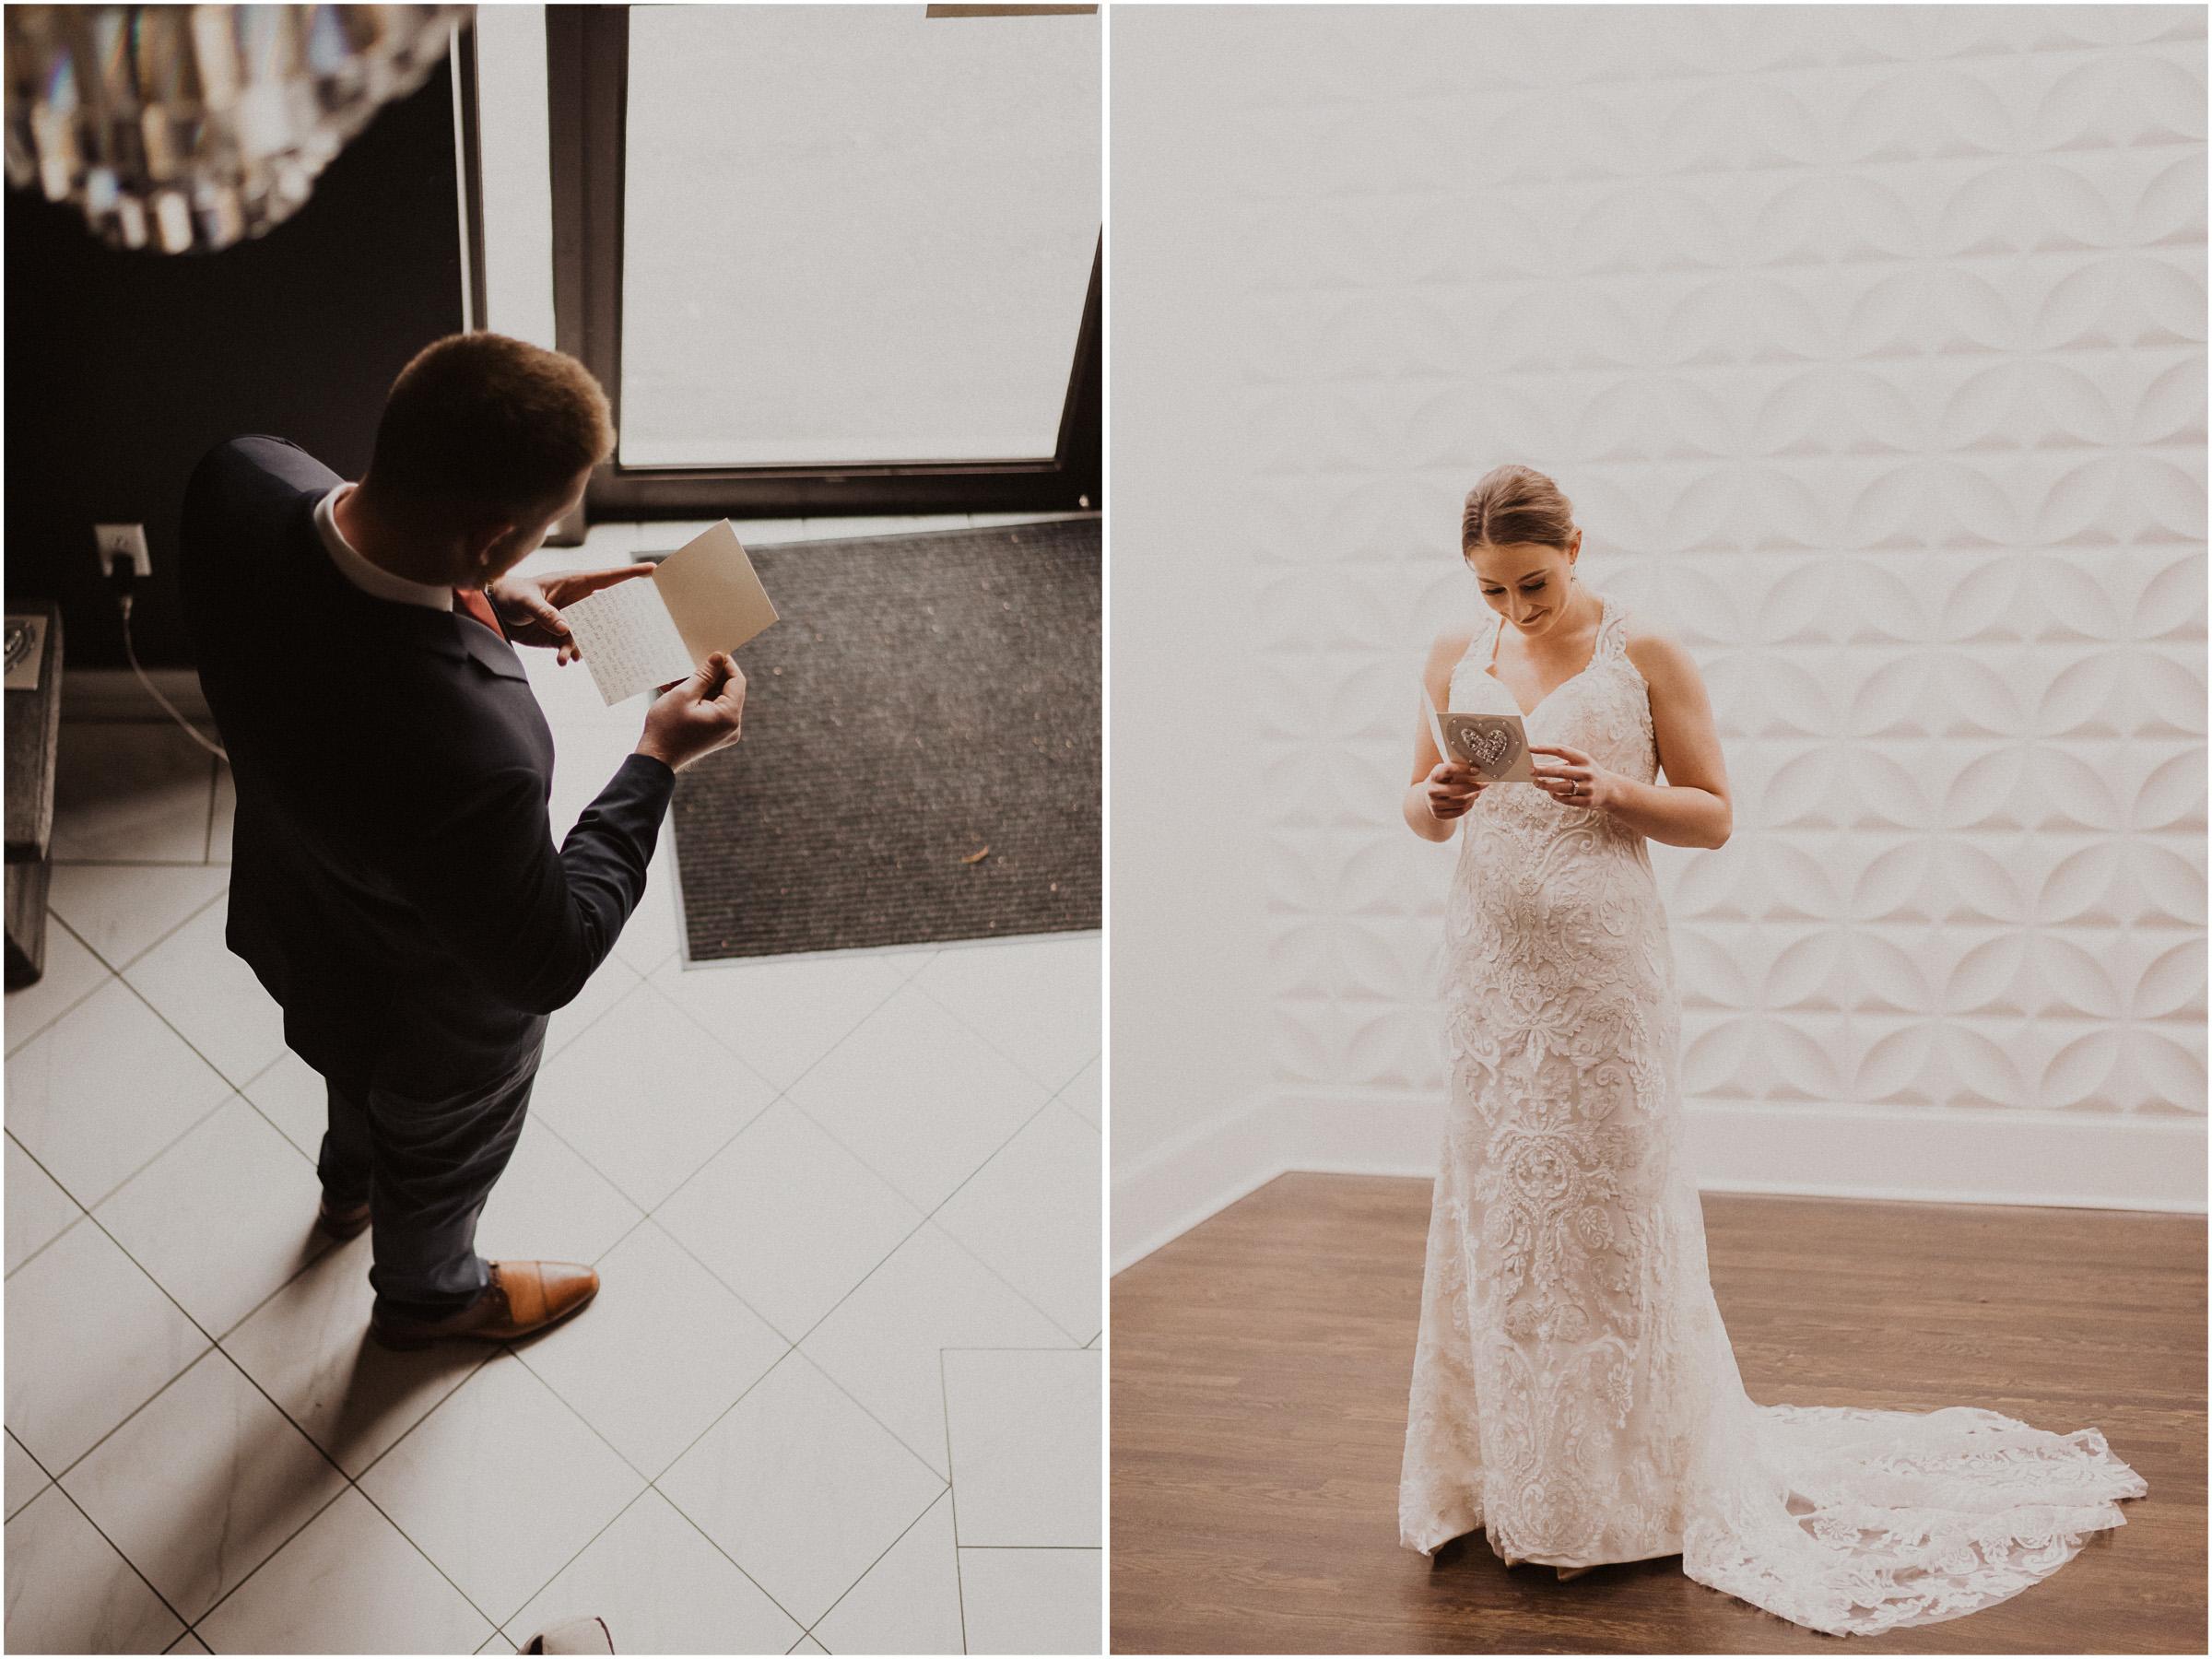 alyssa barletter photography 2016 main kansas city wedding rainy day photographer grace and justin magott-13.jpg